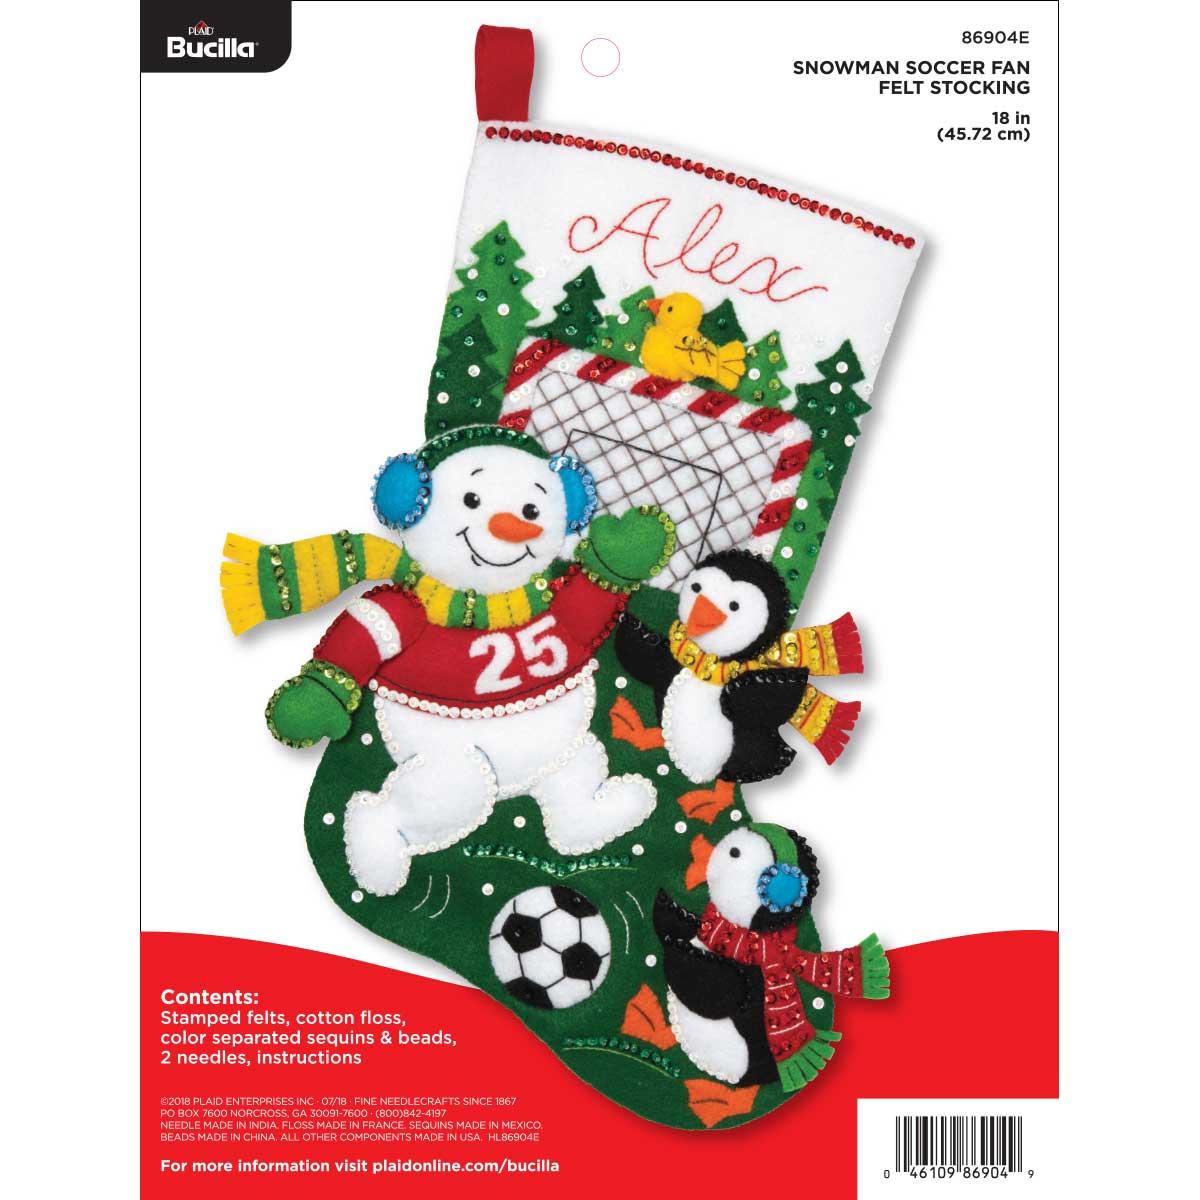 Bucilla ® Seasonal - Felt - Stocking Kits - Snowman Soccer Fan